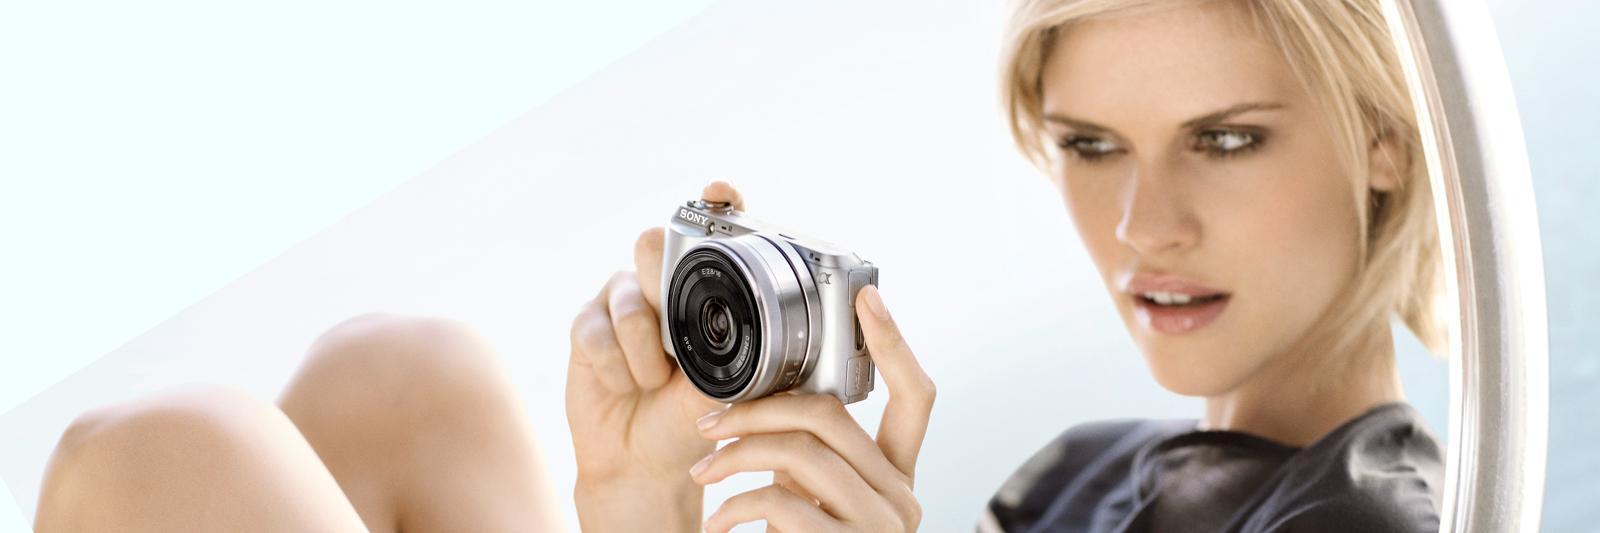 17 nye kameraer kommer i september